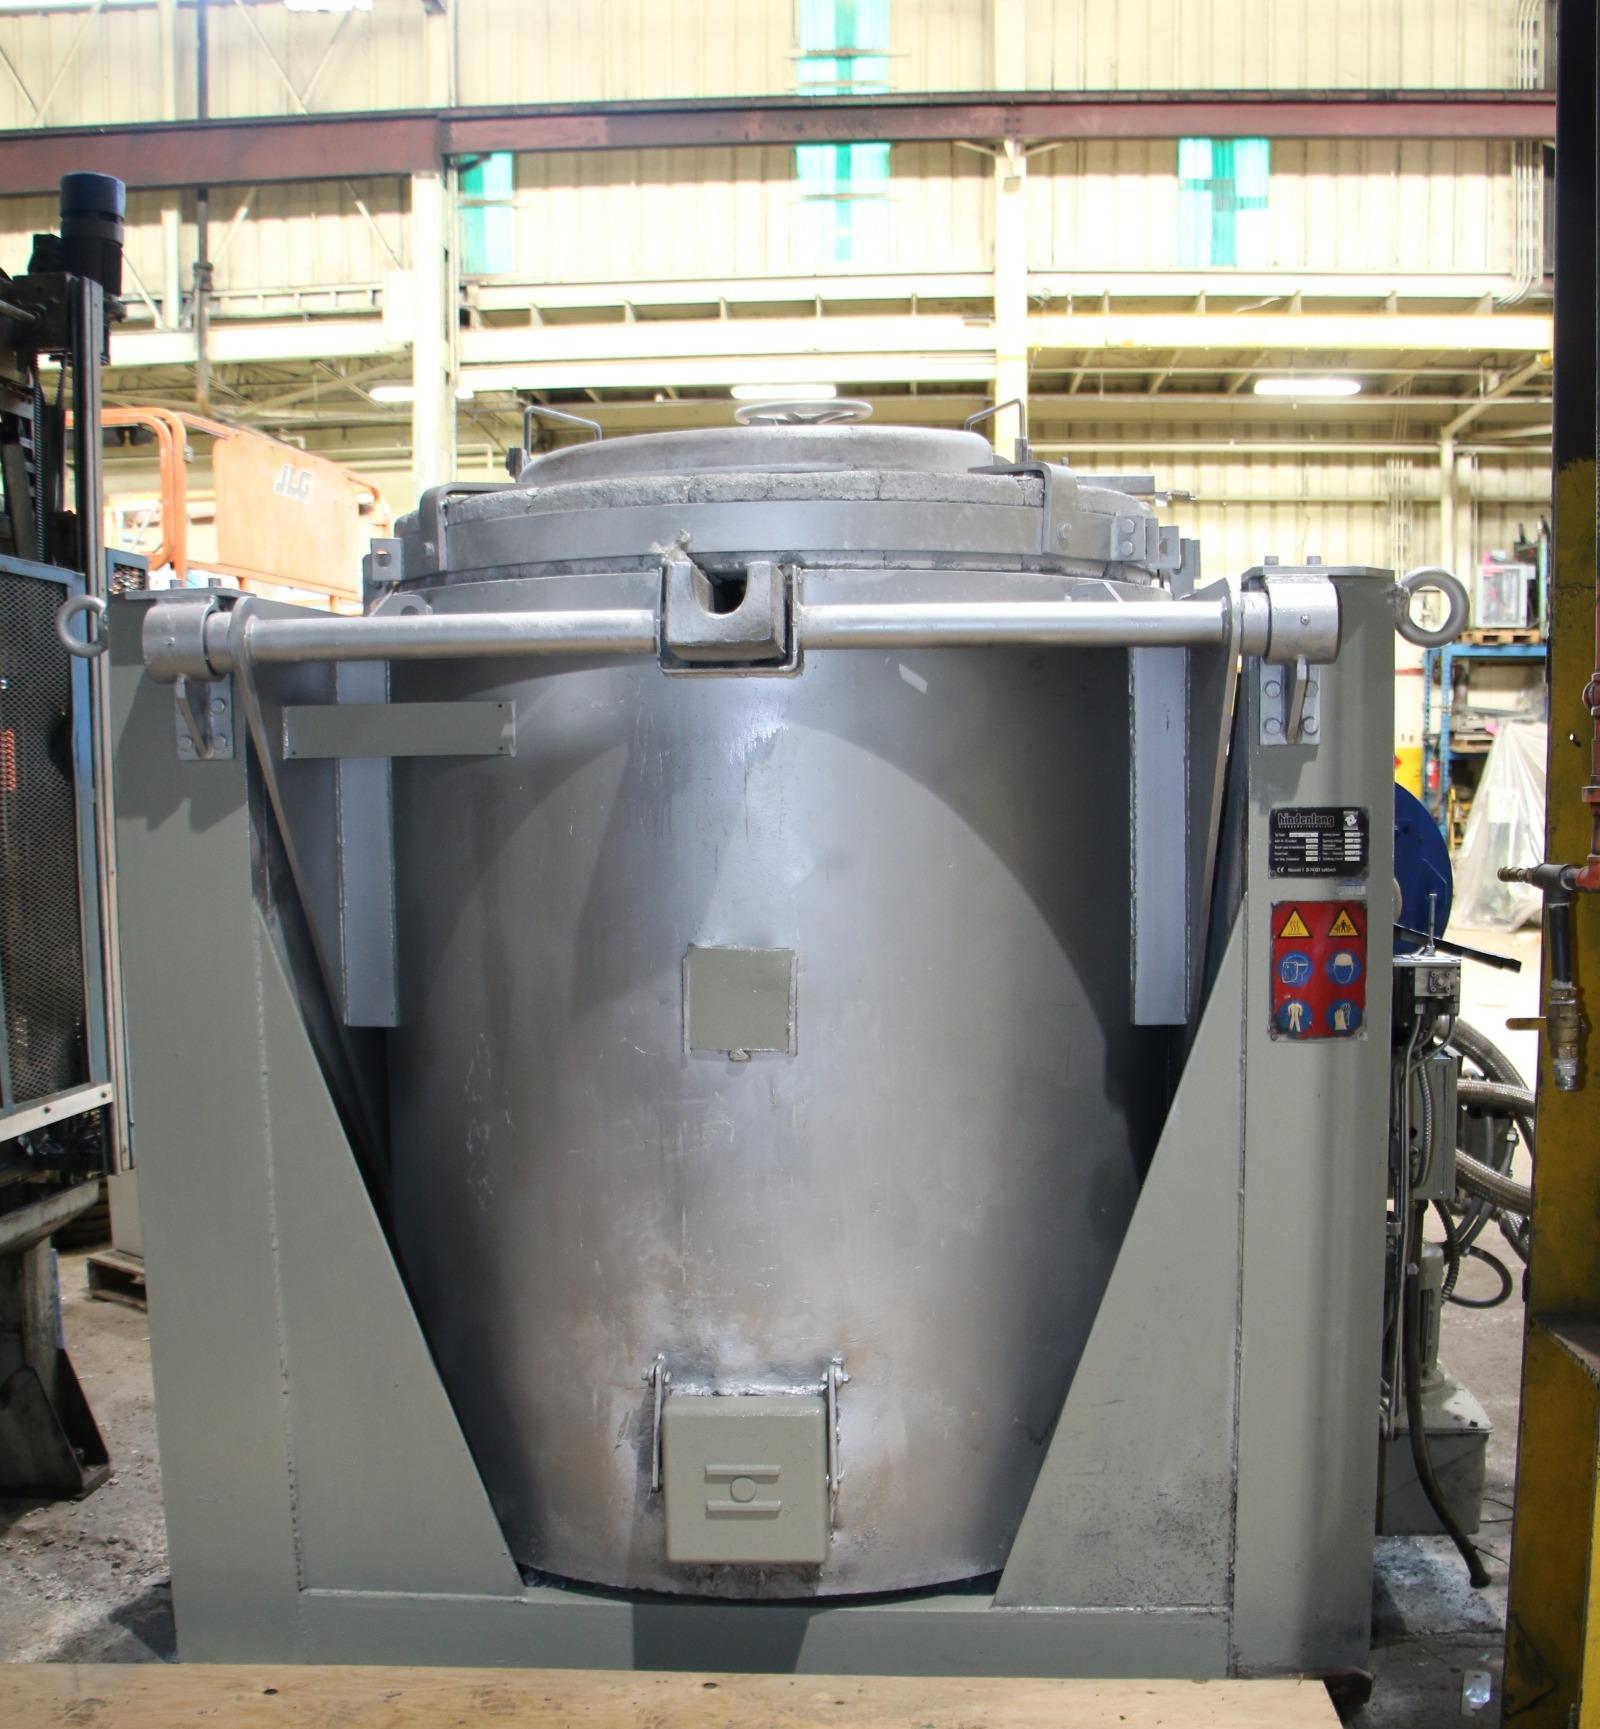 Used Hindenlang 2646 Lbs Gas Melting Furnace #4659